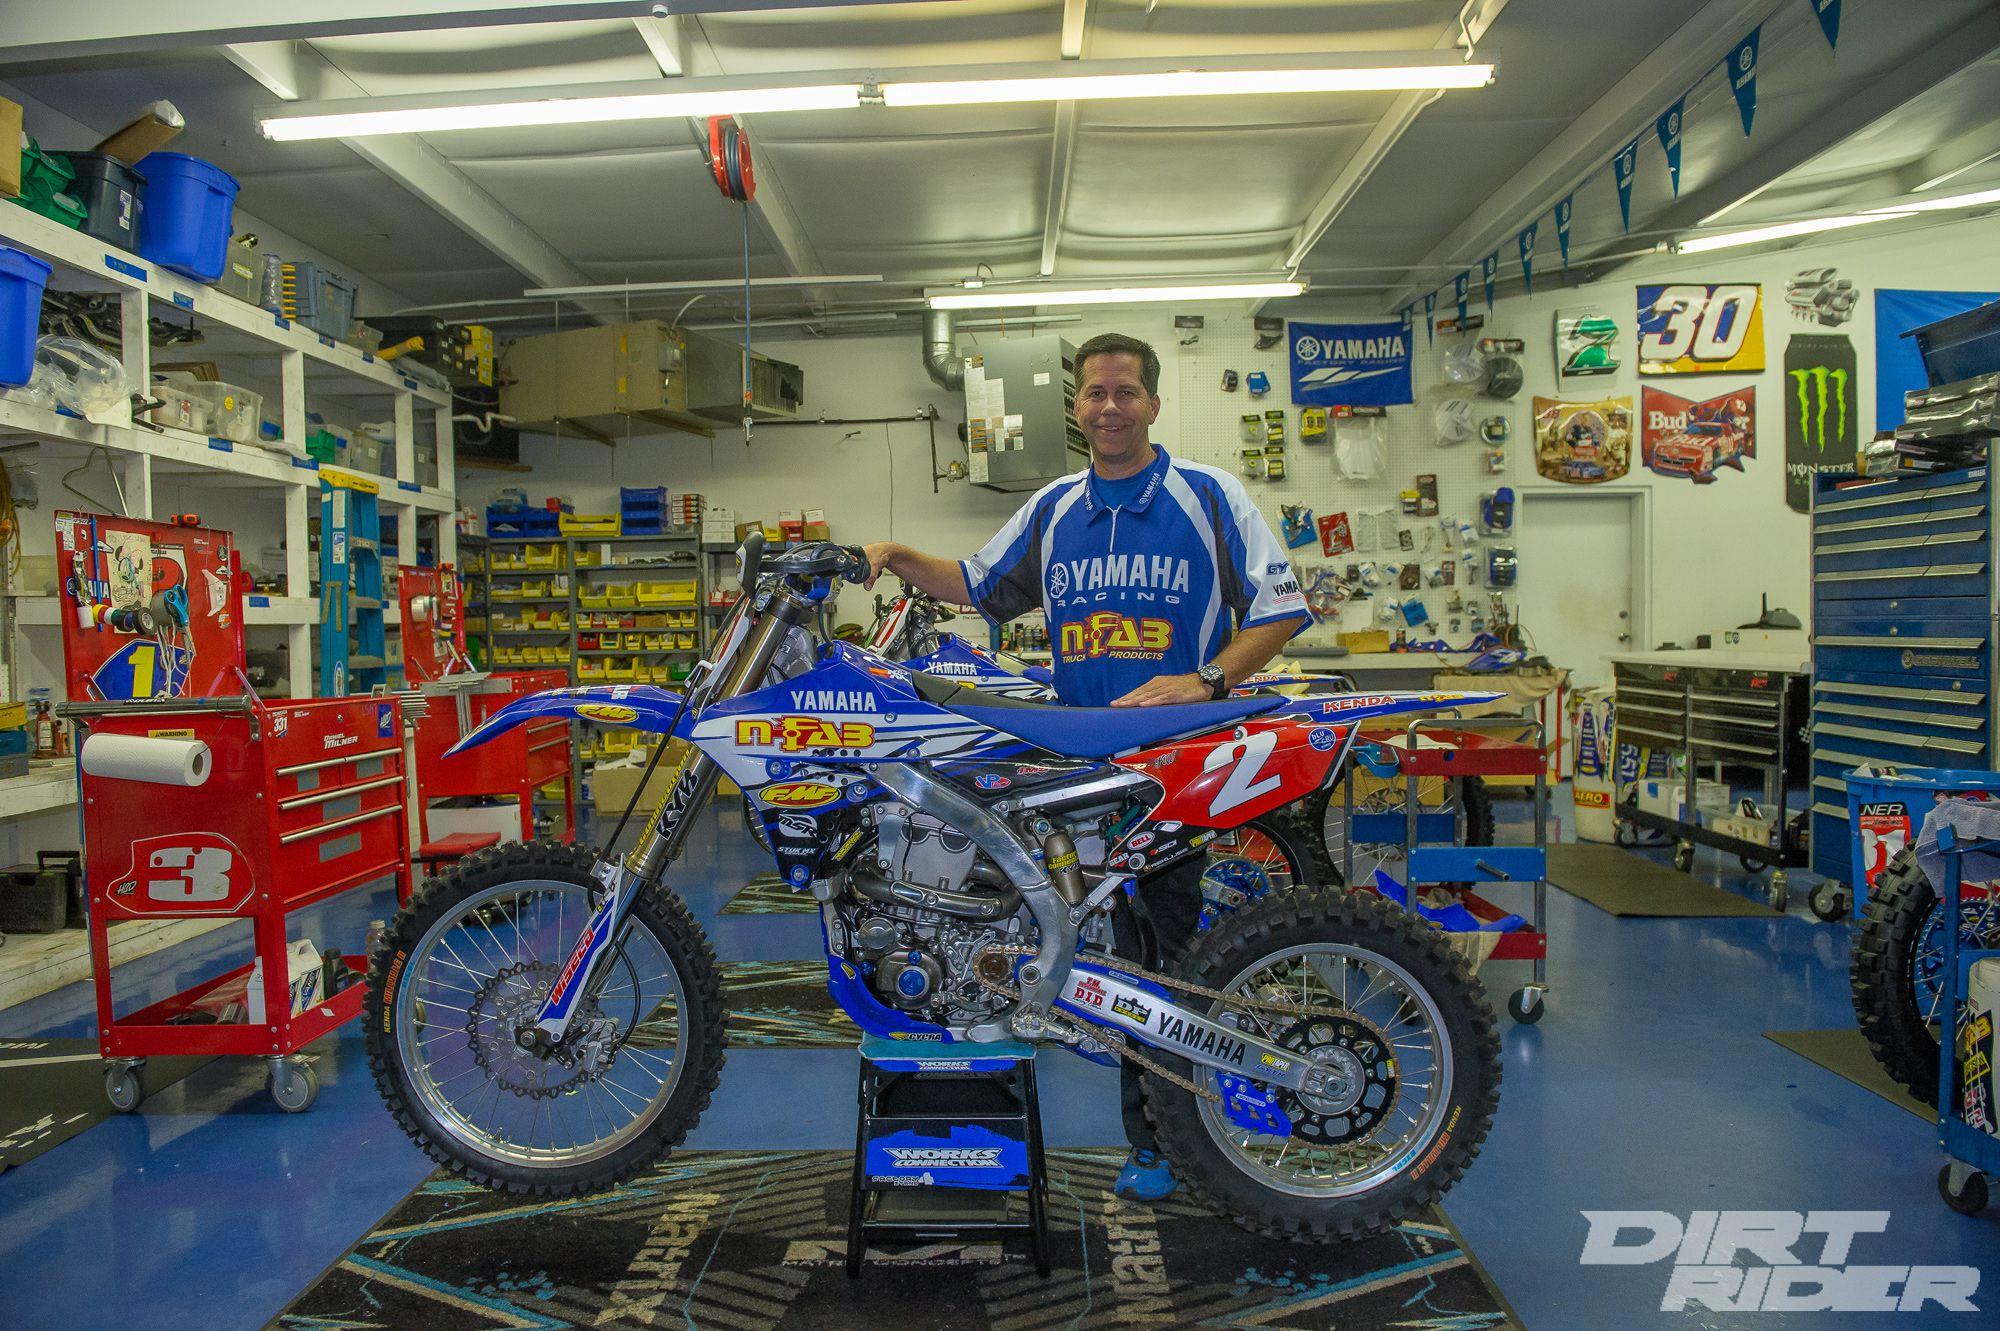 Champions' Motocross & Off-Road Bike Modifications | Dirt Rider